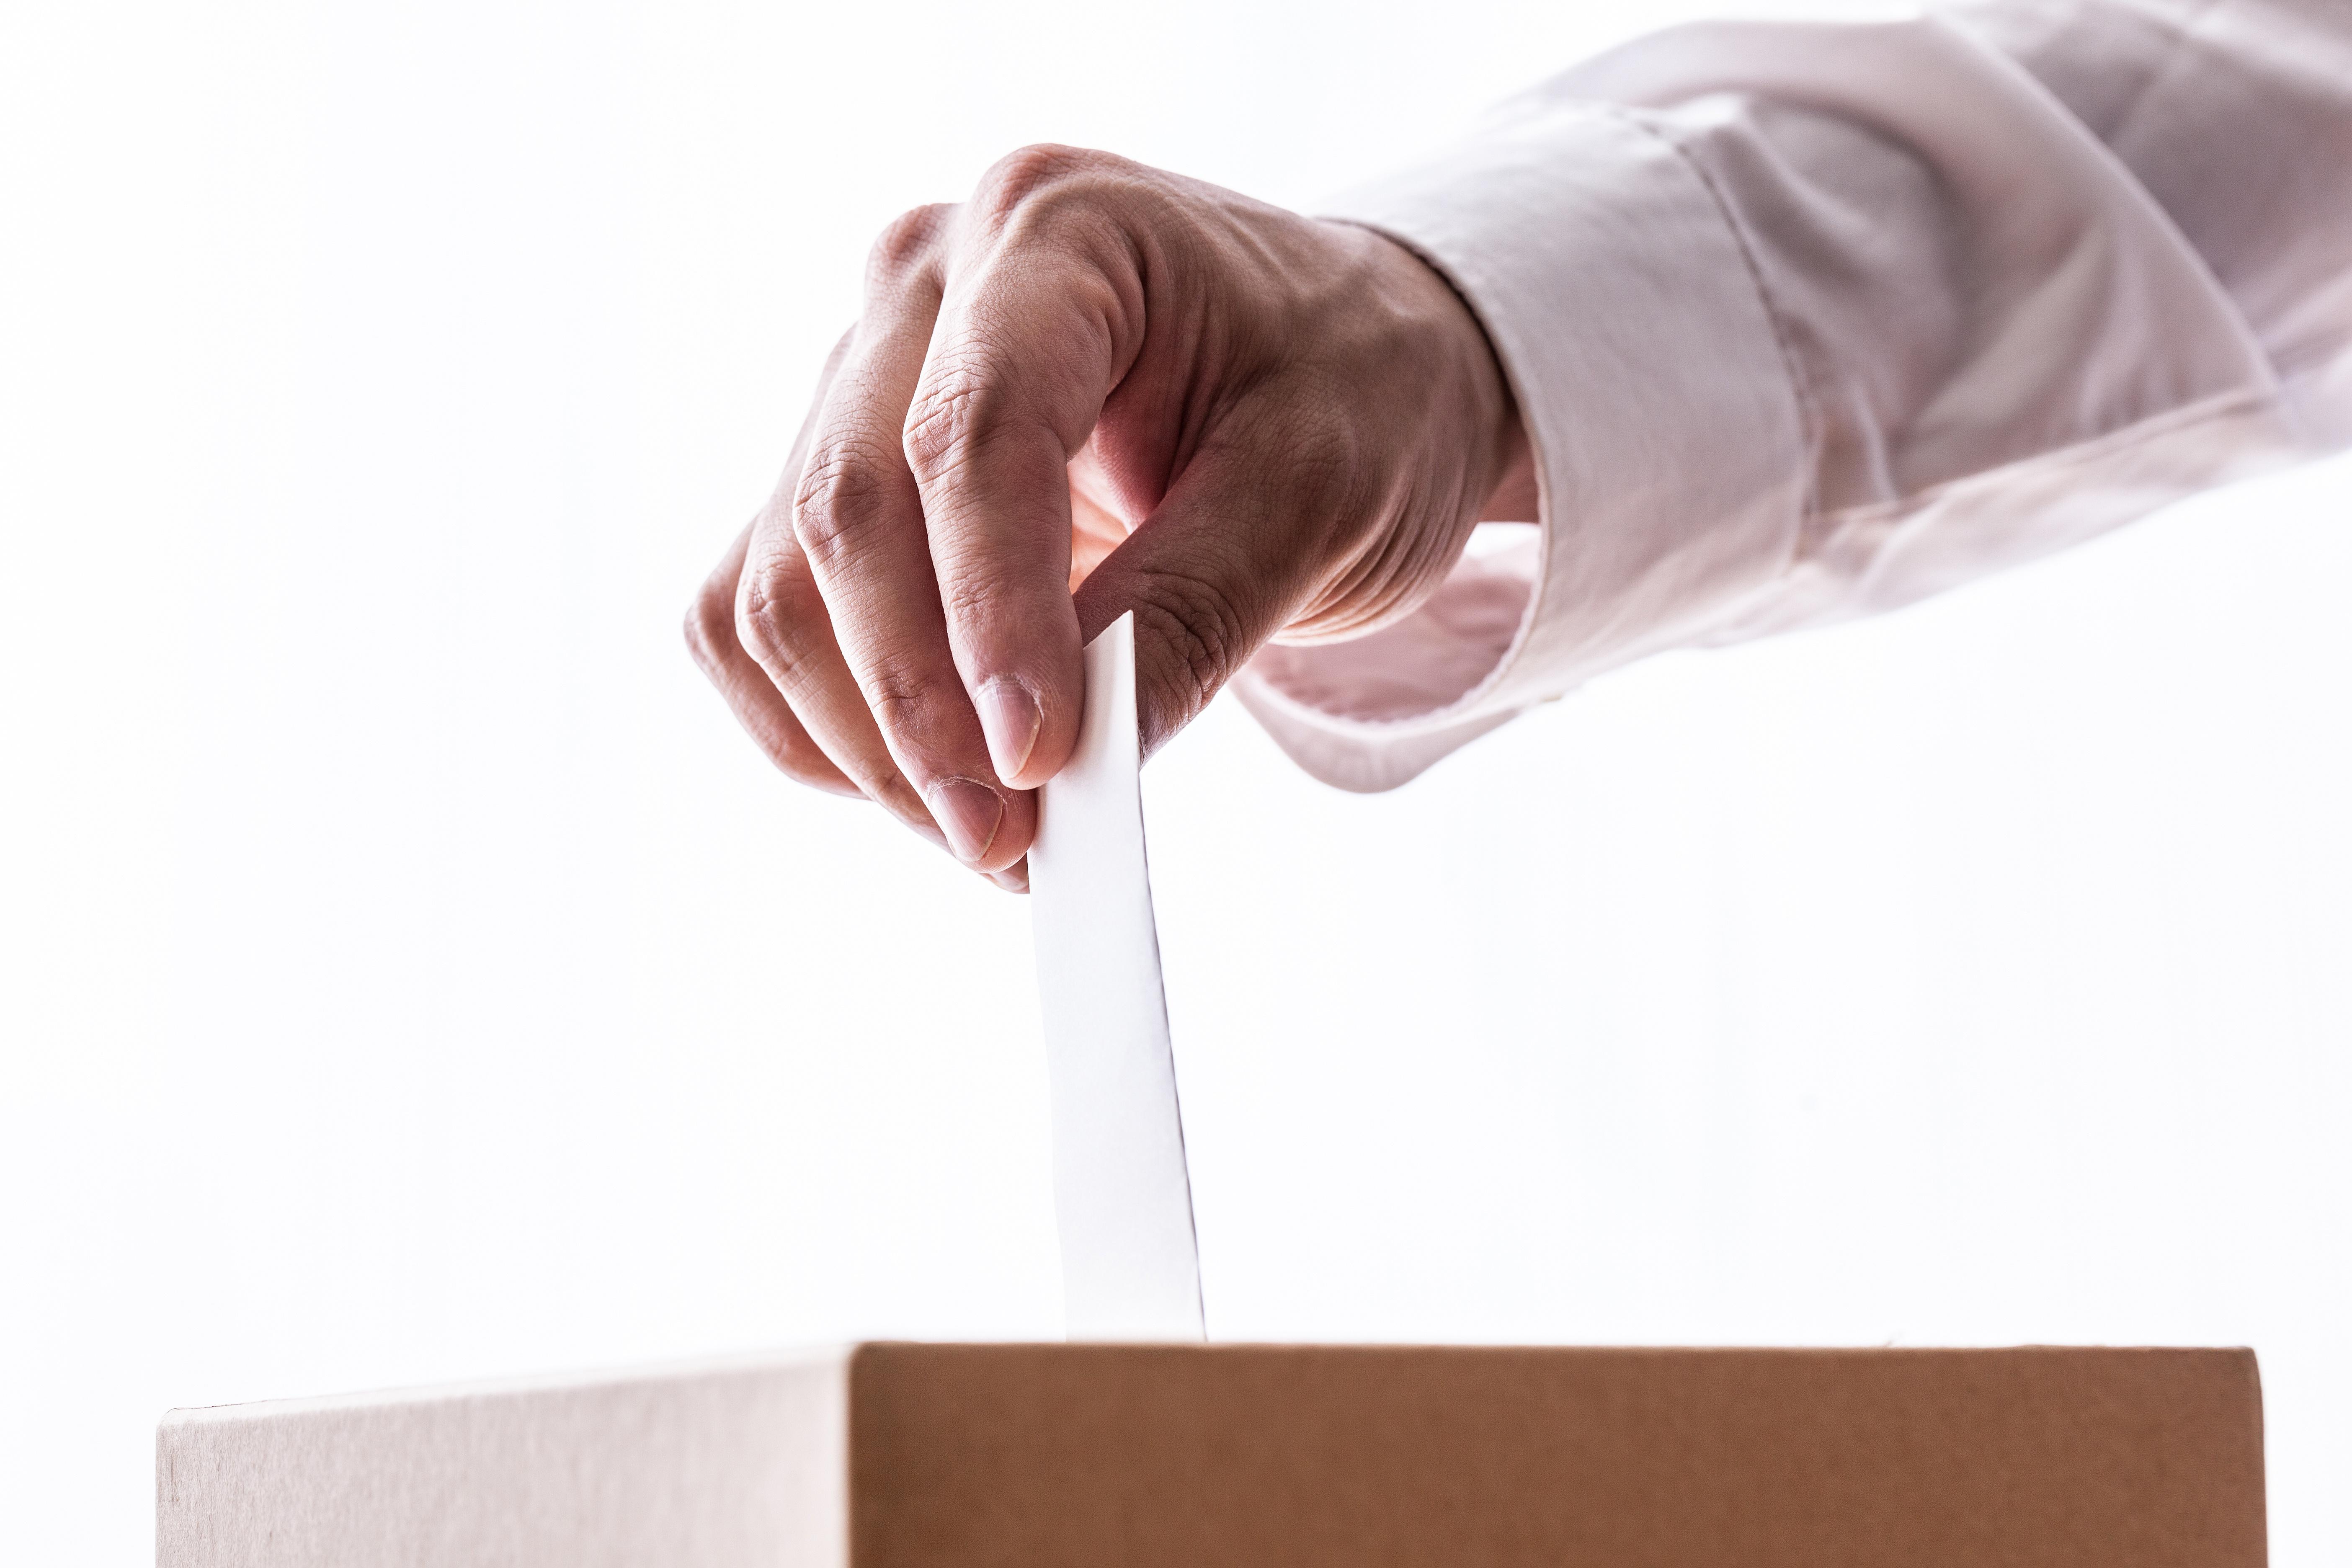 AdobeStock 116234571 - 選挙で同票?!運命の結果はくじ引きに託された…【POTETOリサーチ】